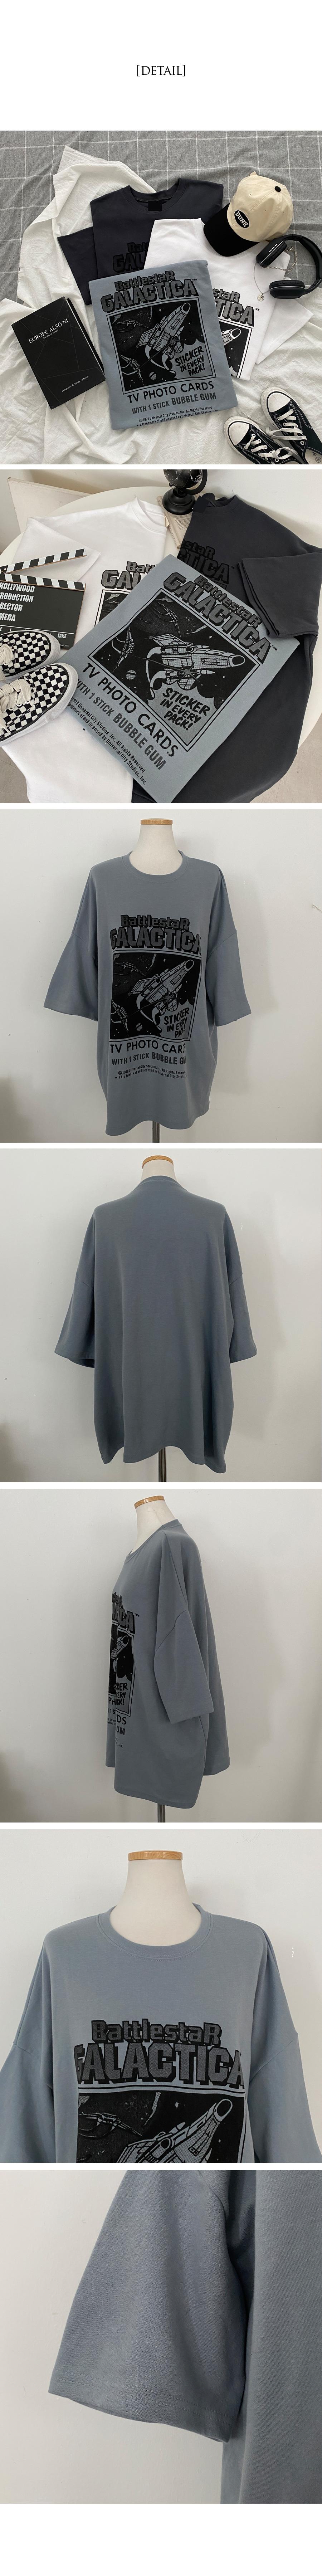 Spaceship Overfit Short Sleeve T-shirt